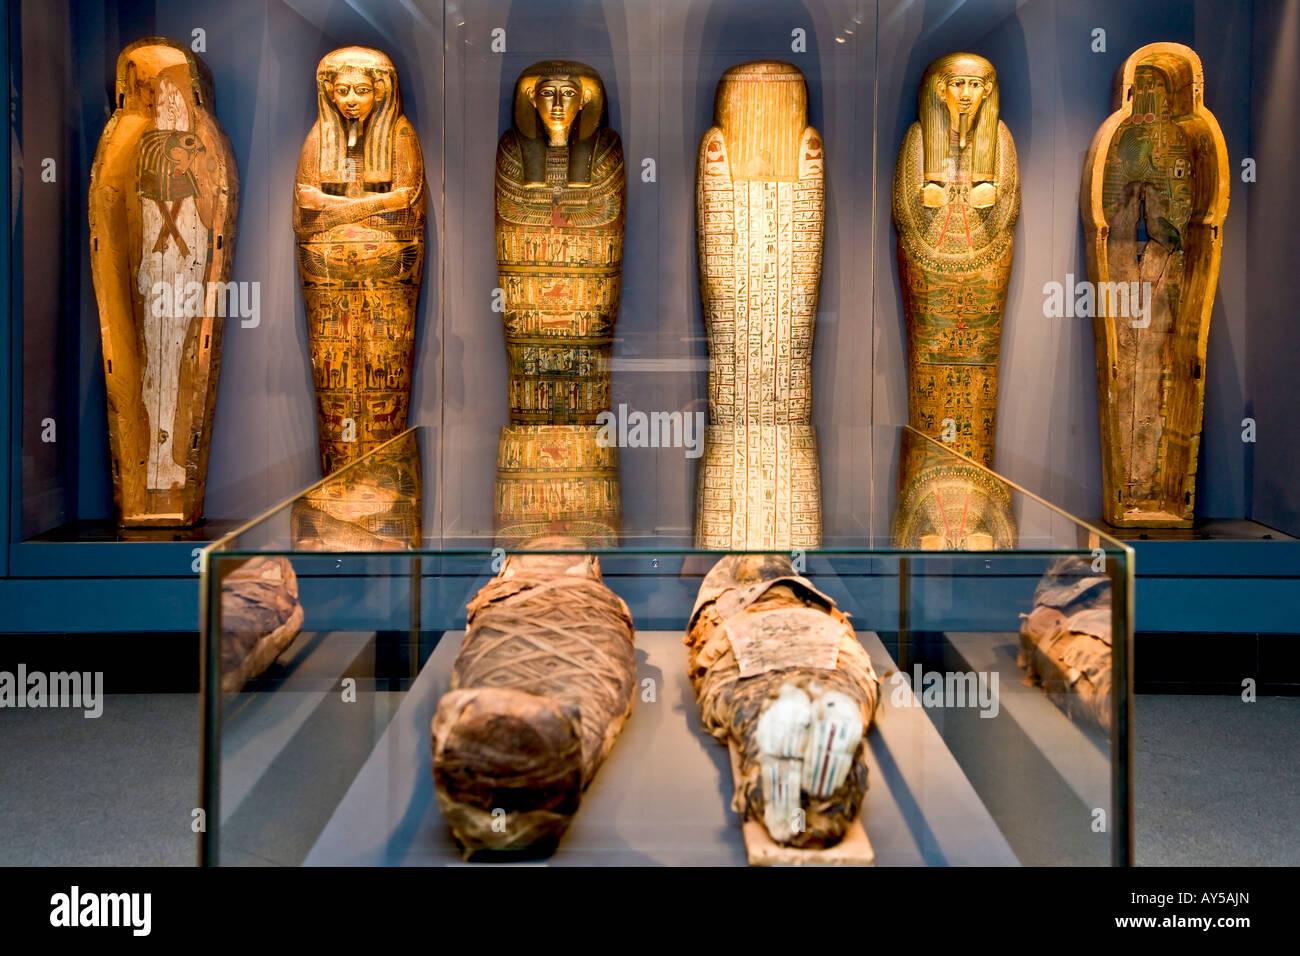 Sarcophagus - Stock Image